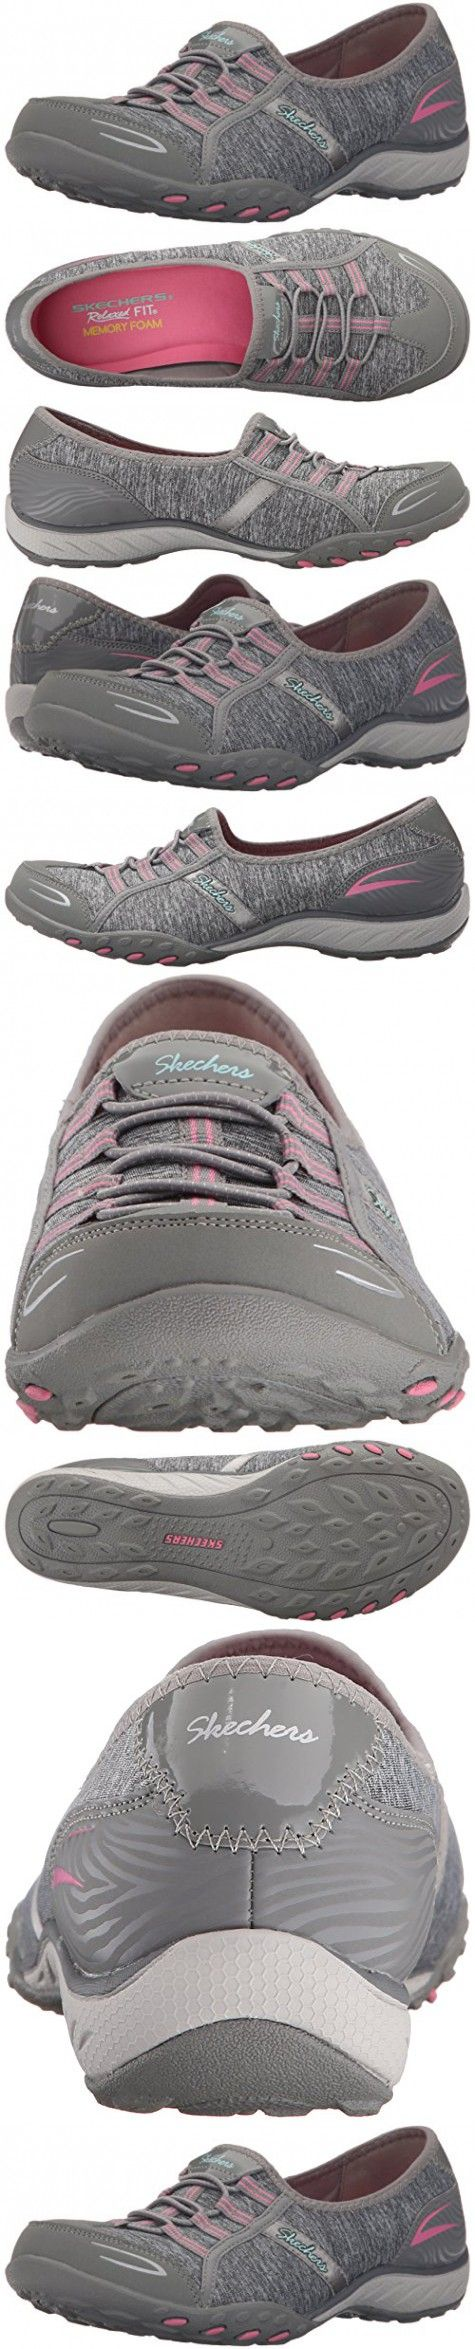 Zapatillas para caminar RYKA Women's Dash 3, gris / rosa, 5 m US